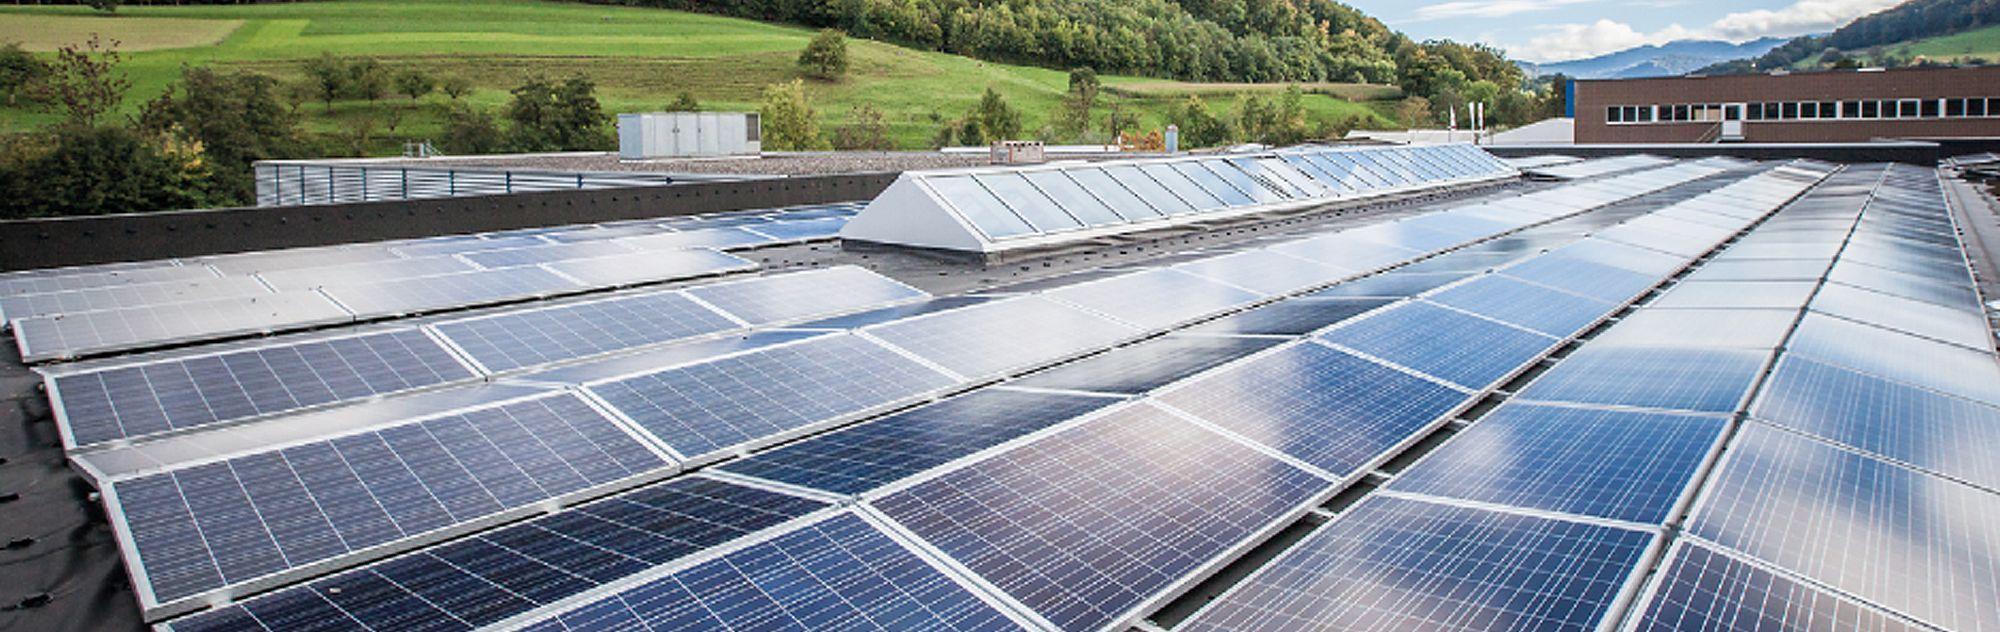 Photovoltaikanlagen Landwirte